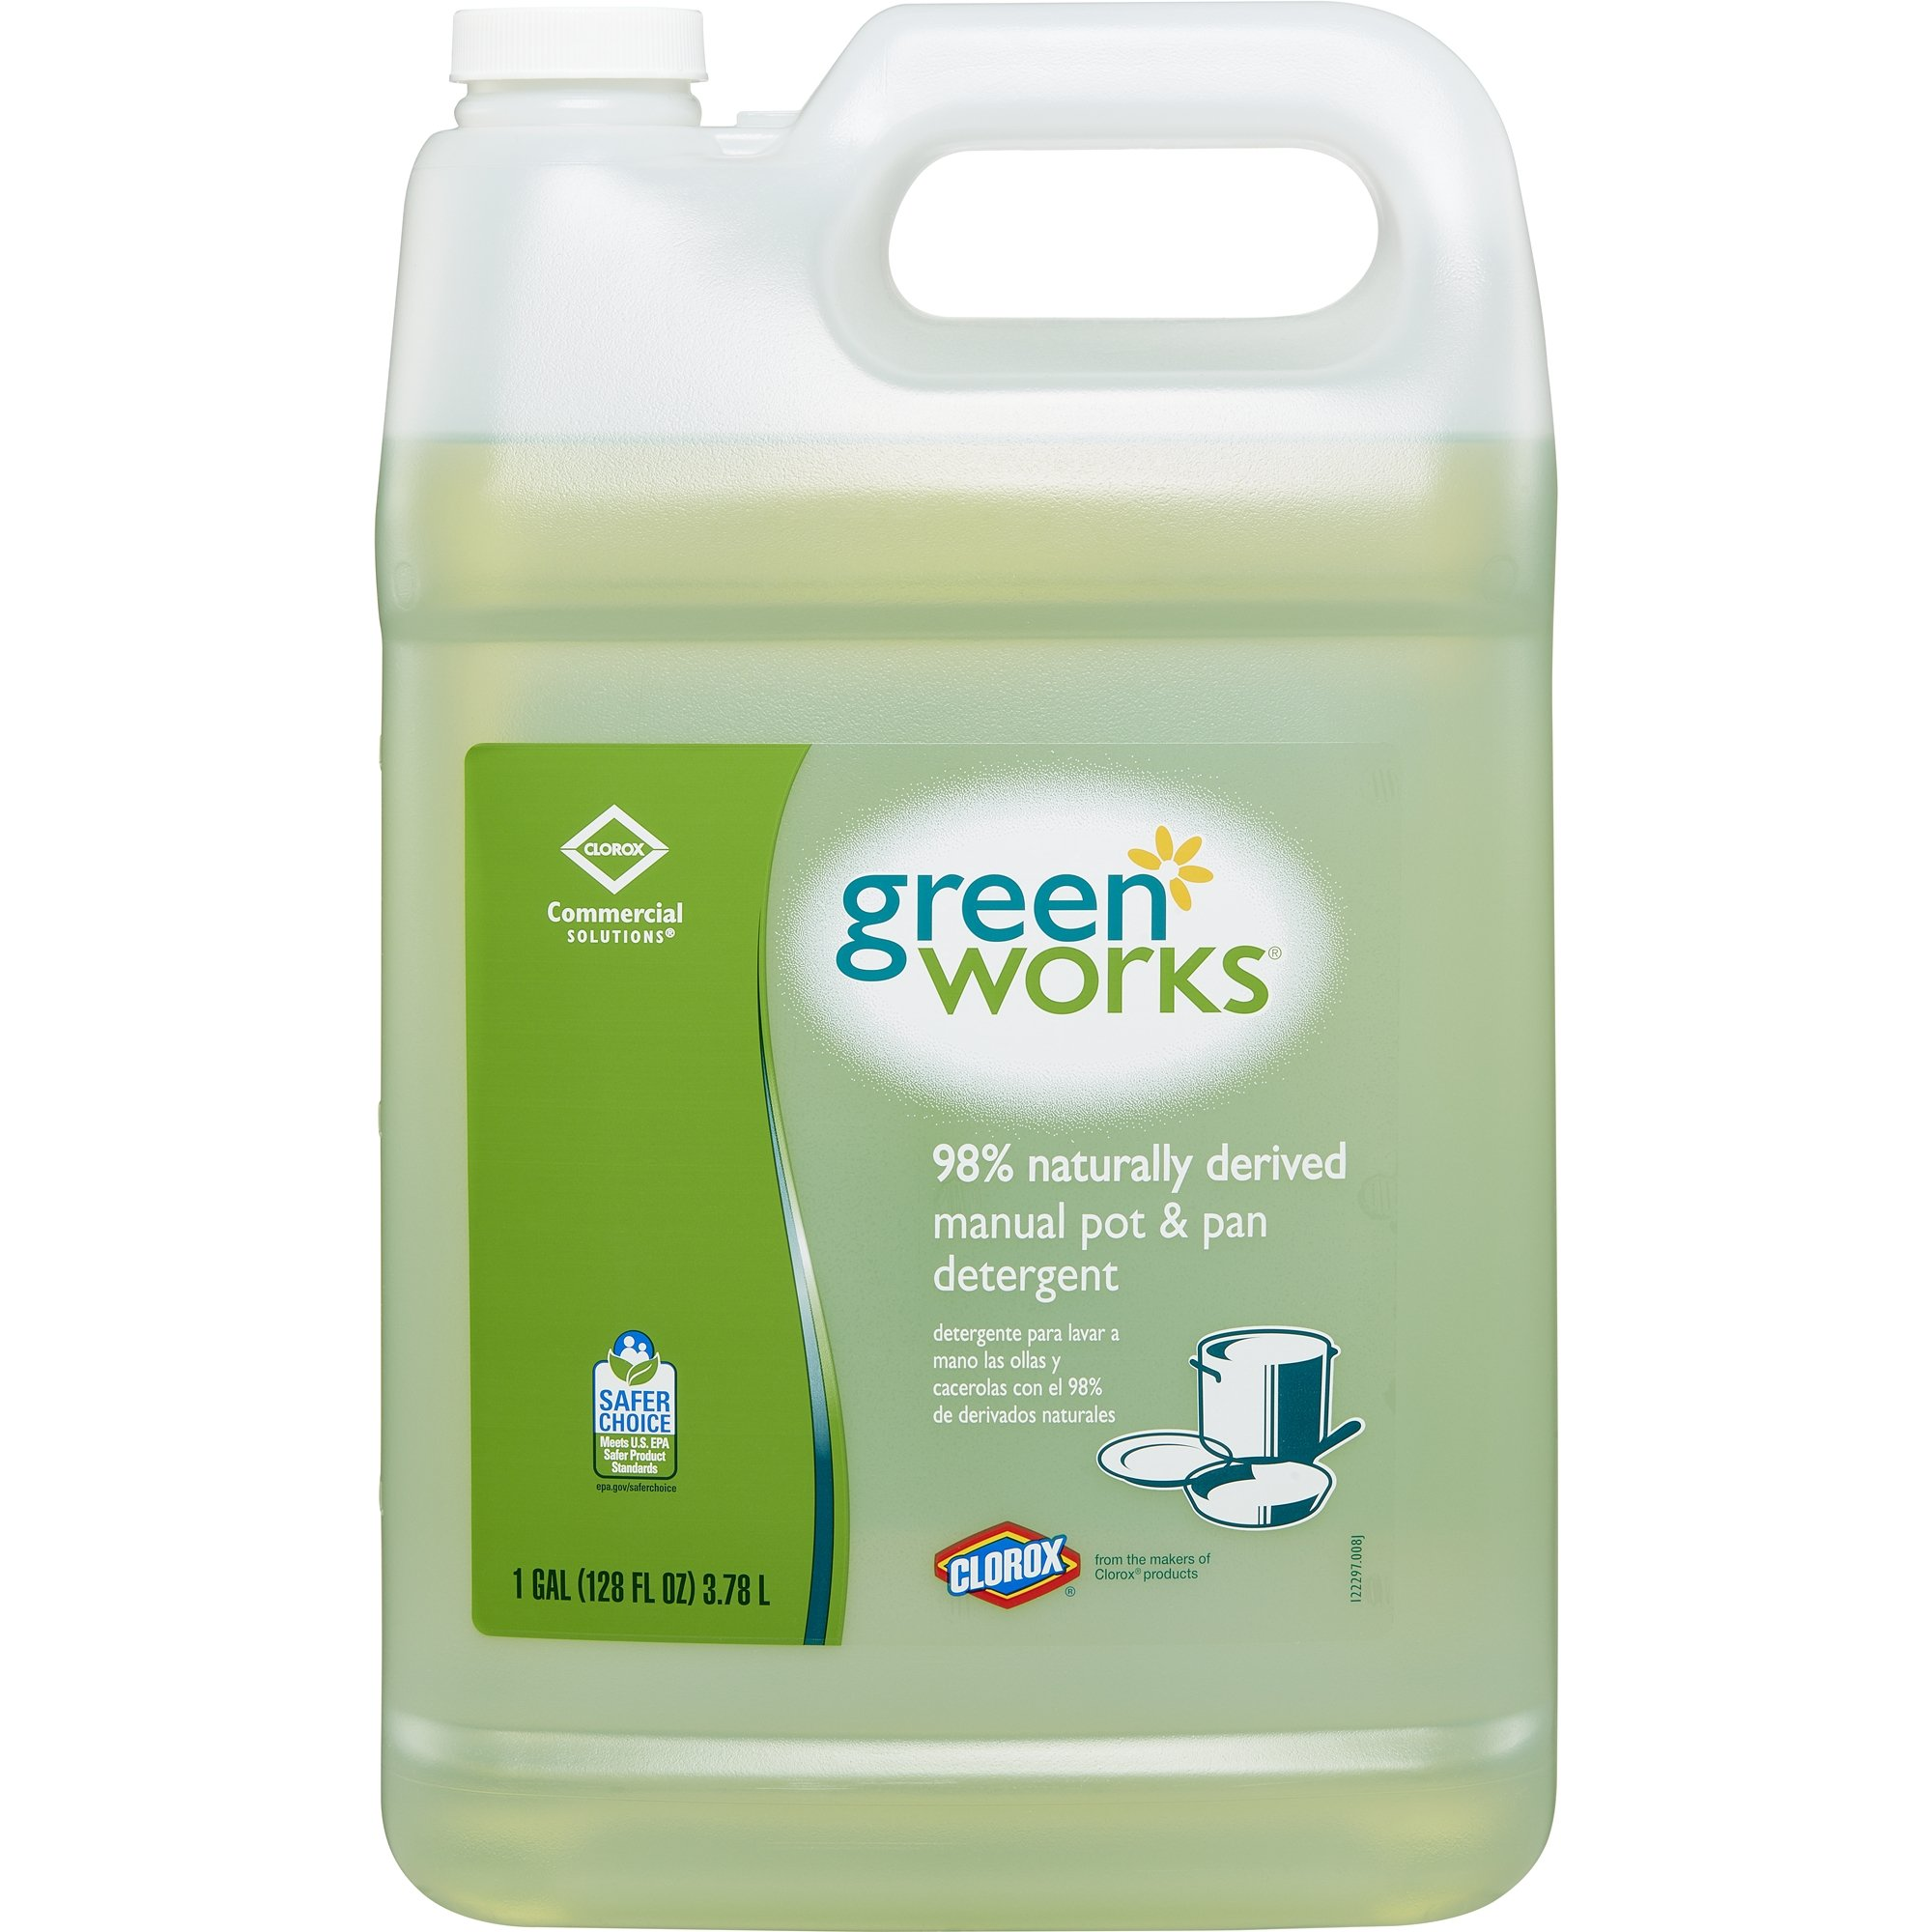 Green Works Manual Pot & Pan Dishwashing Liquid, 128 Ounces